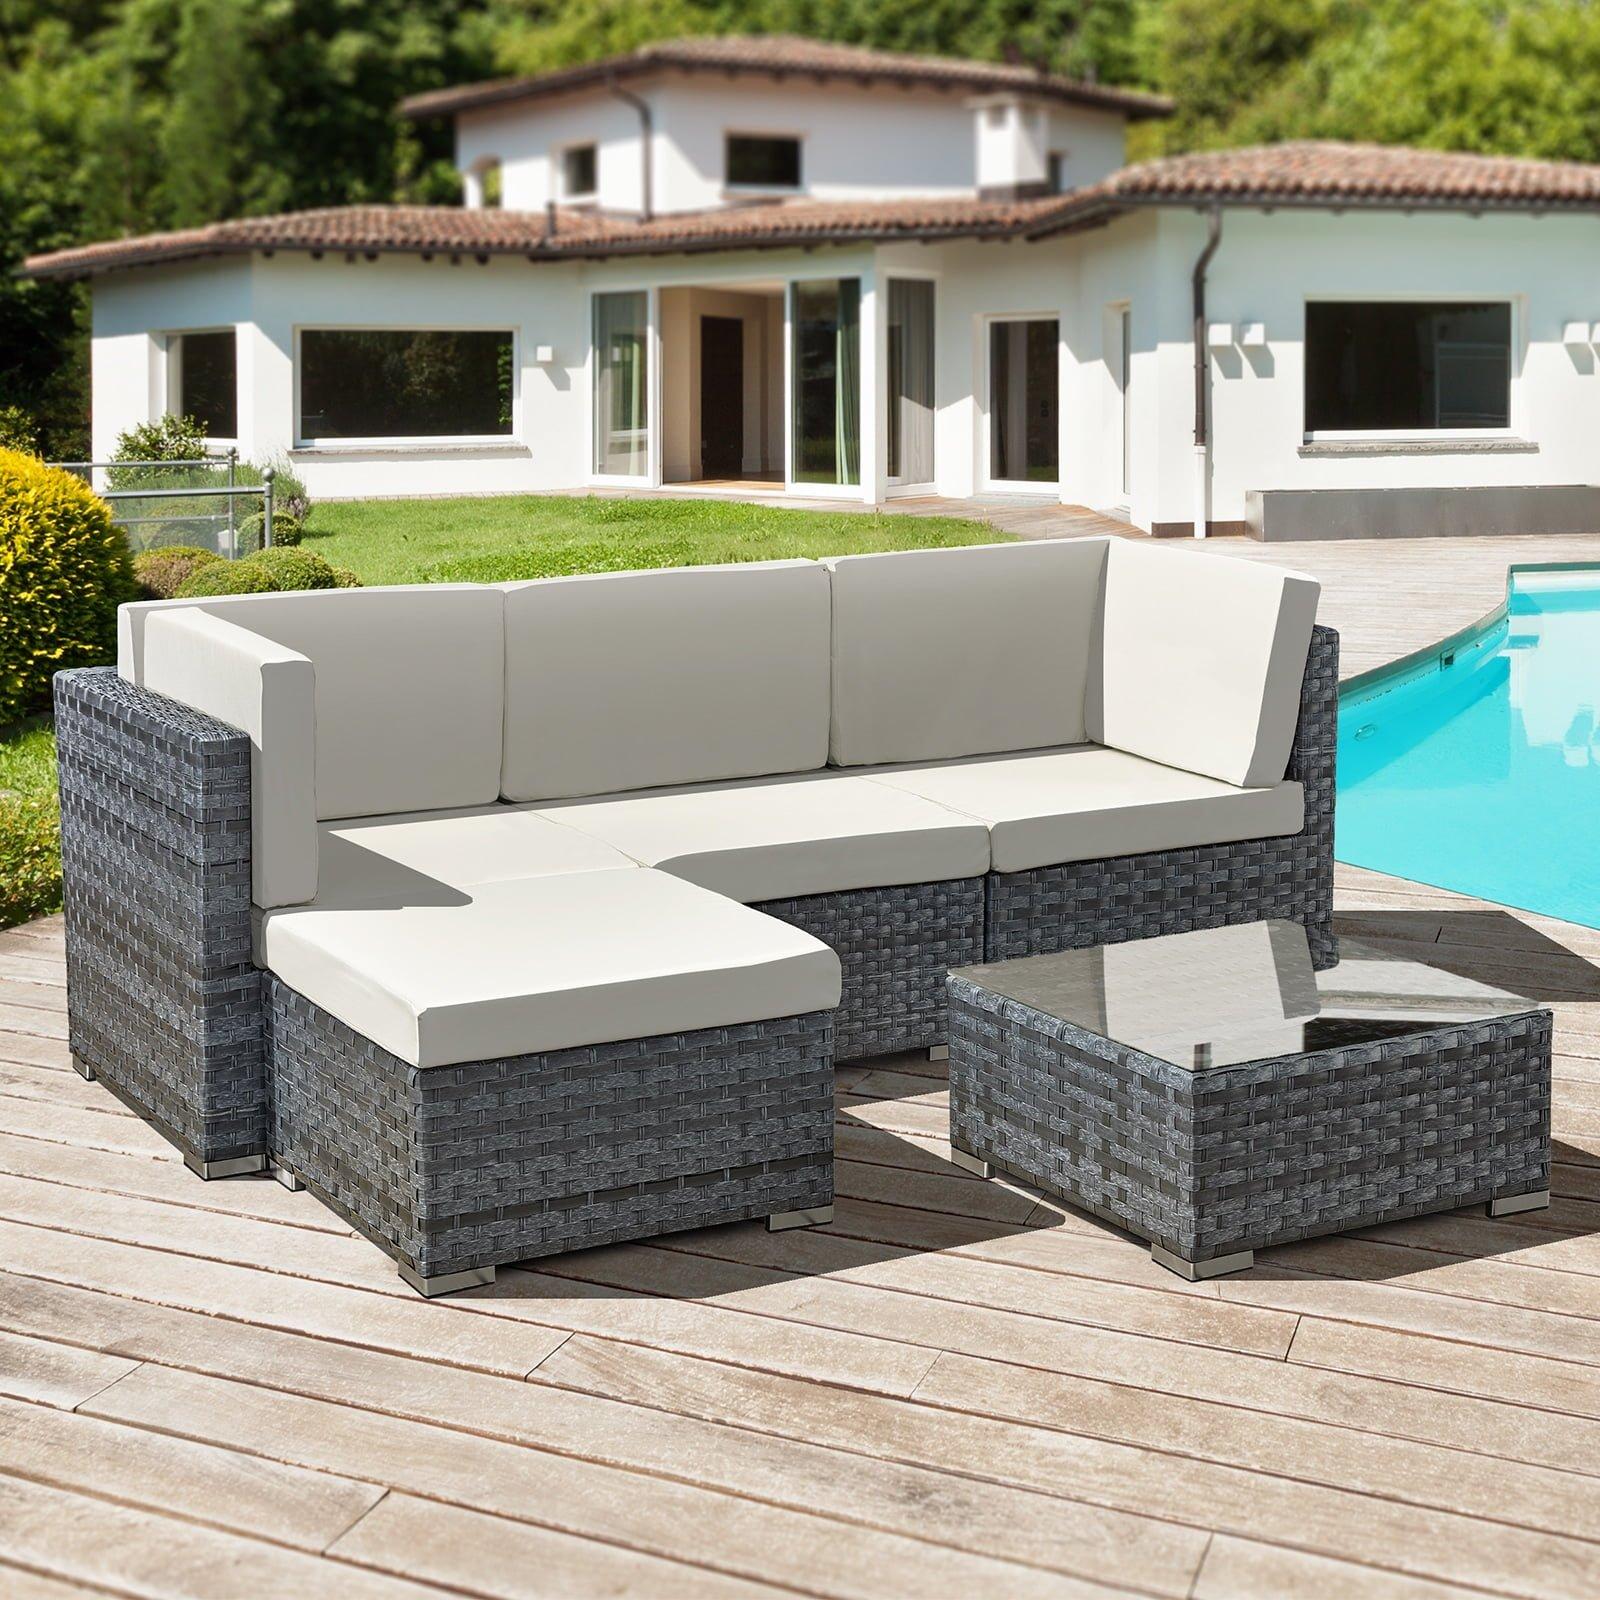 Oseasons® Trinidad 4 seater rattan lounge set - Ocean Grey